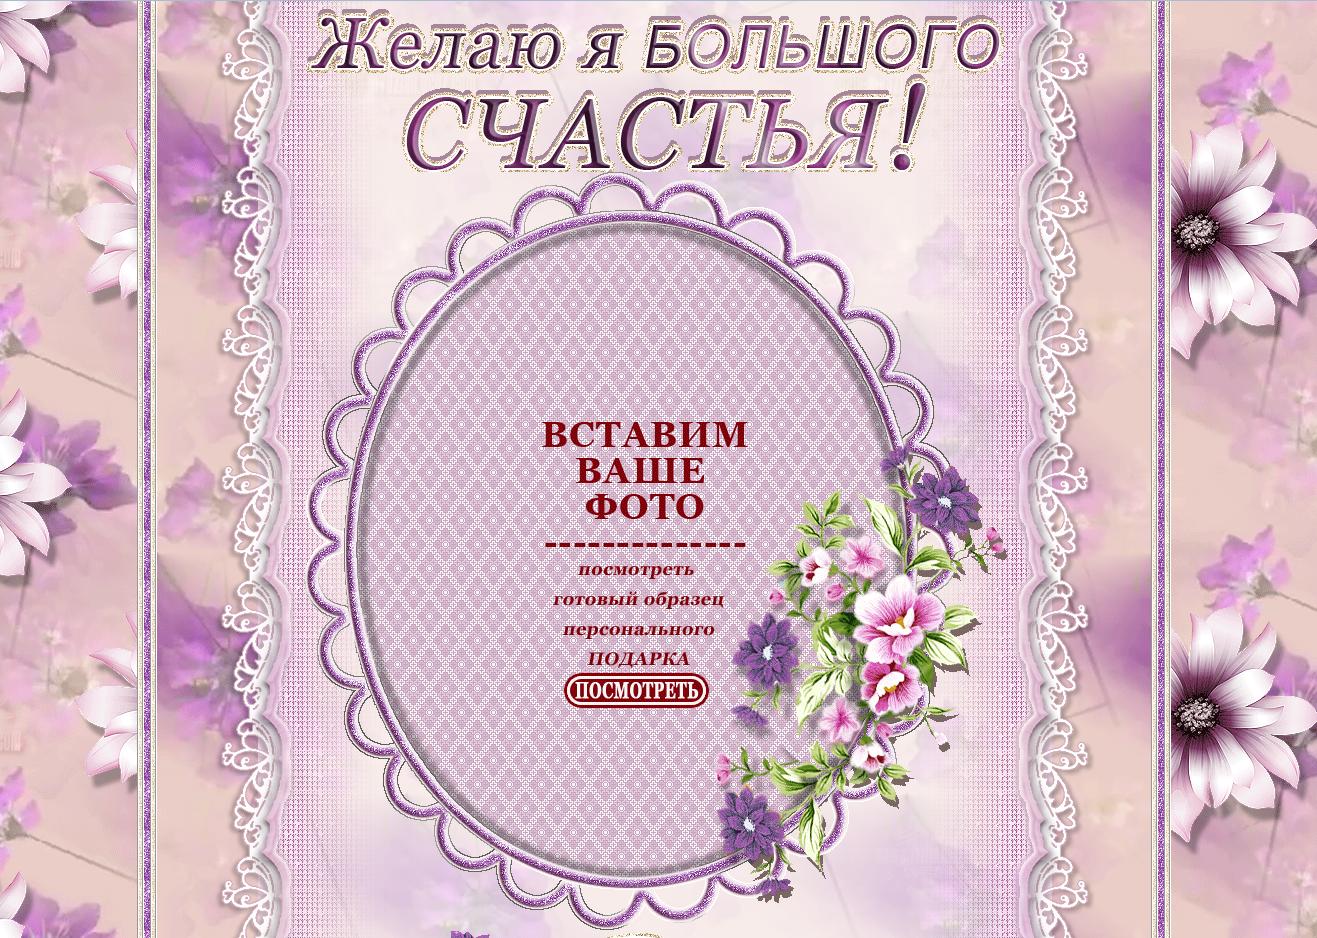 https://img-fotki.yandex.ru/get/241199/164848982.33/0_19e63b_c3946c17_orig